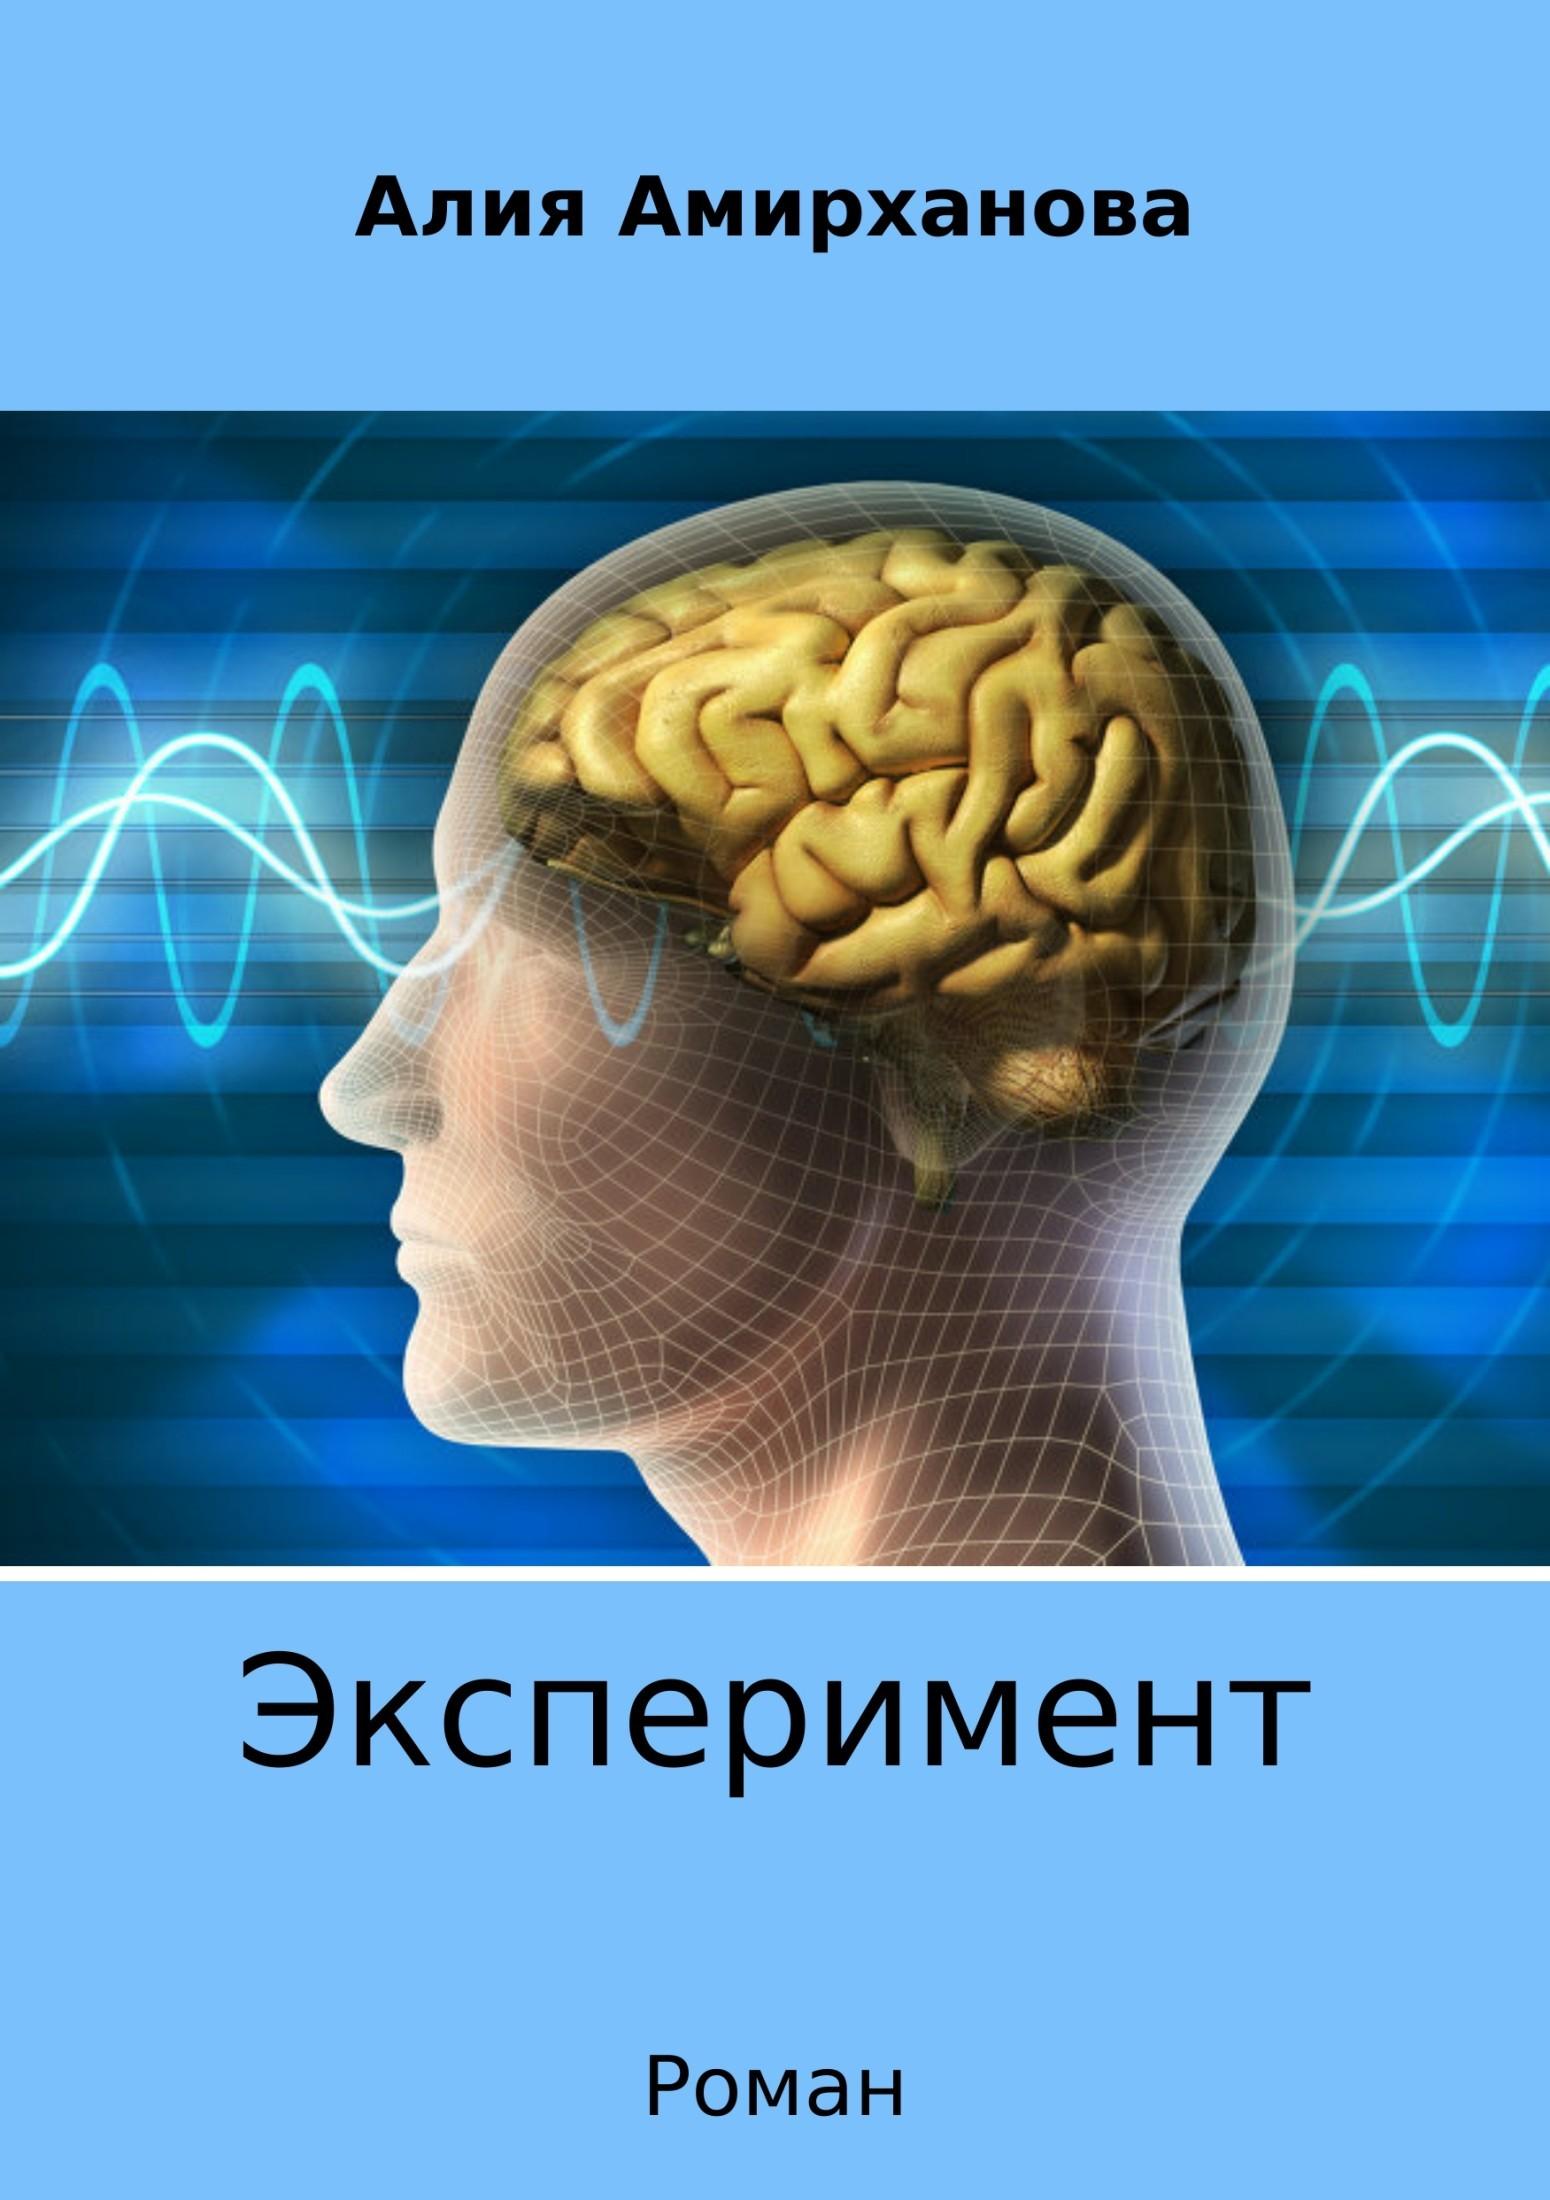 Алия Амирханова Эксперимент датчики